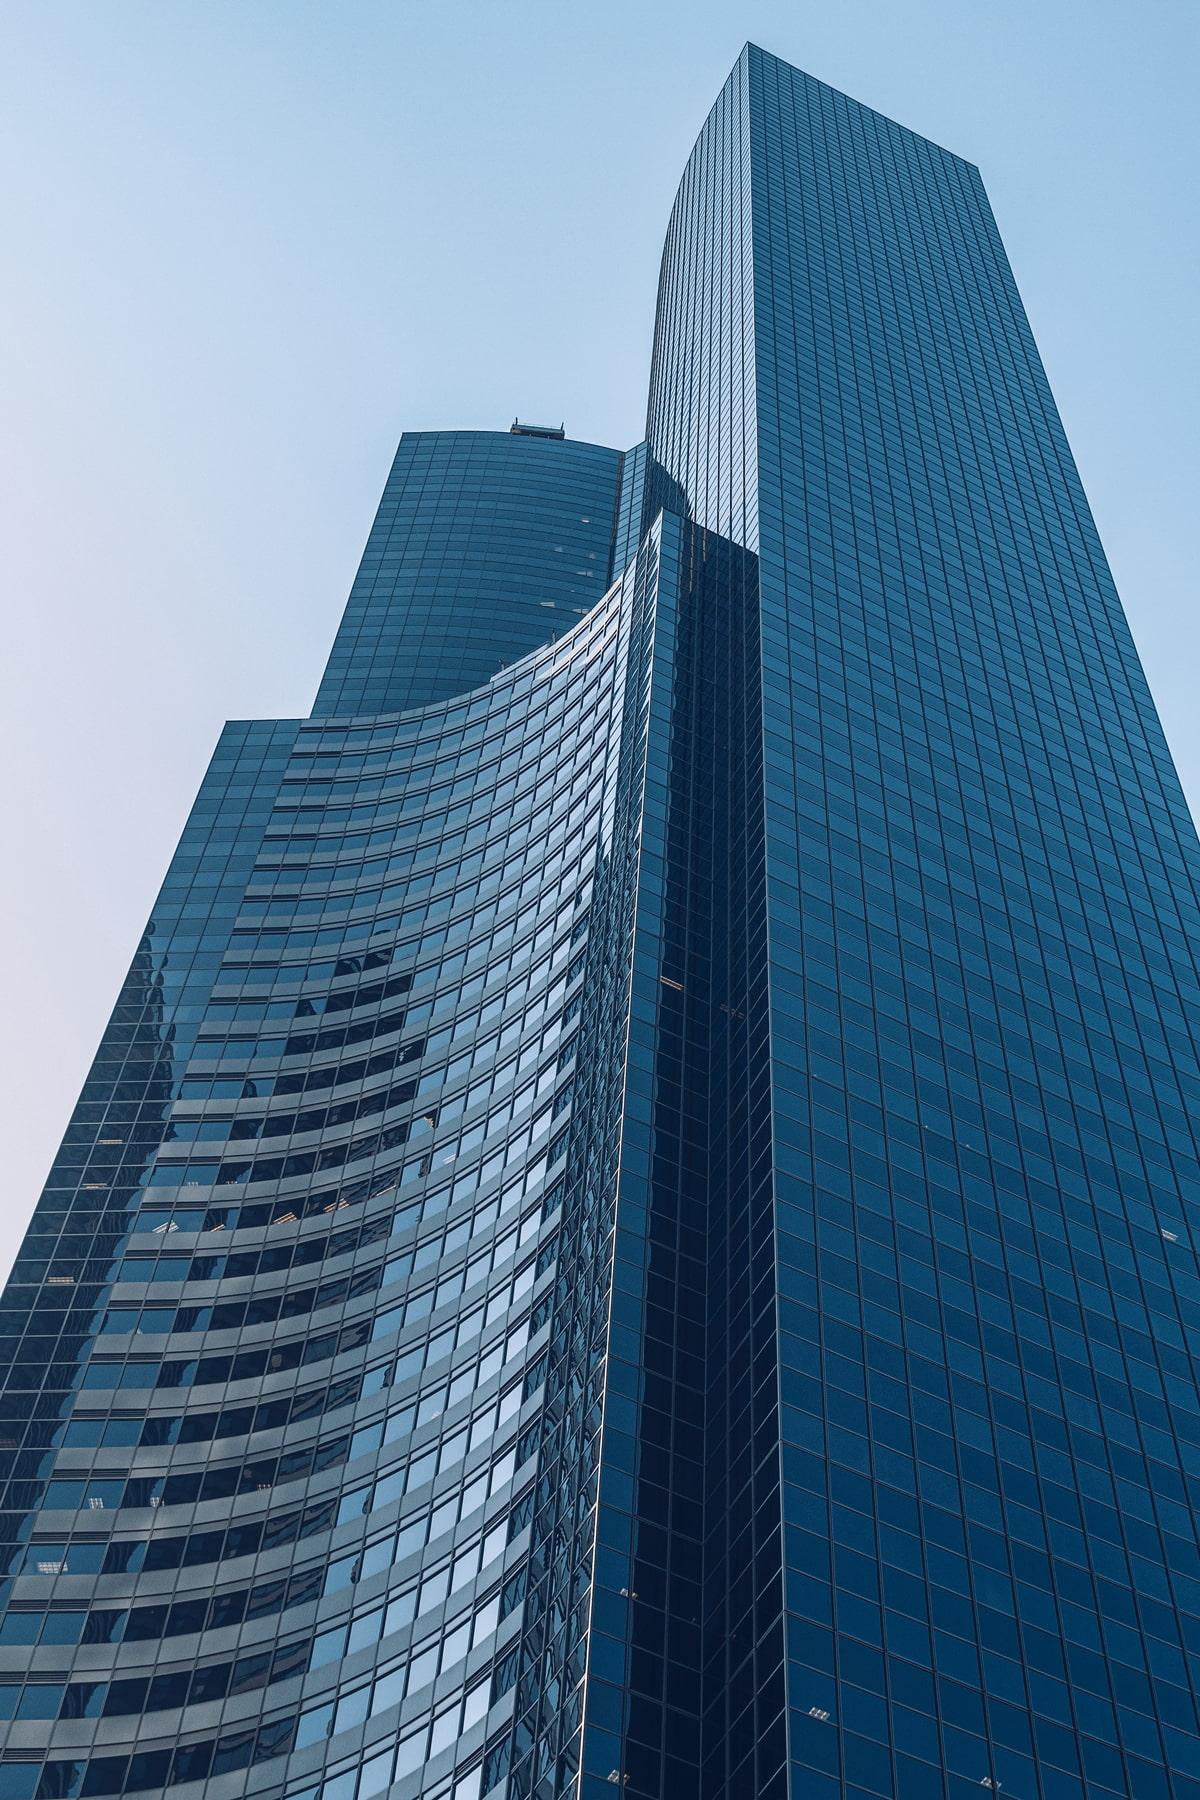 Seattle's tallest building